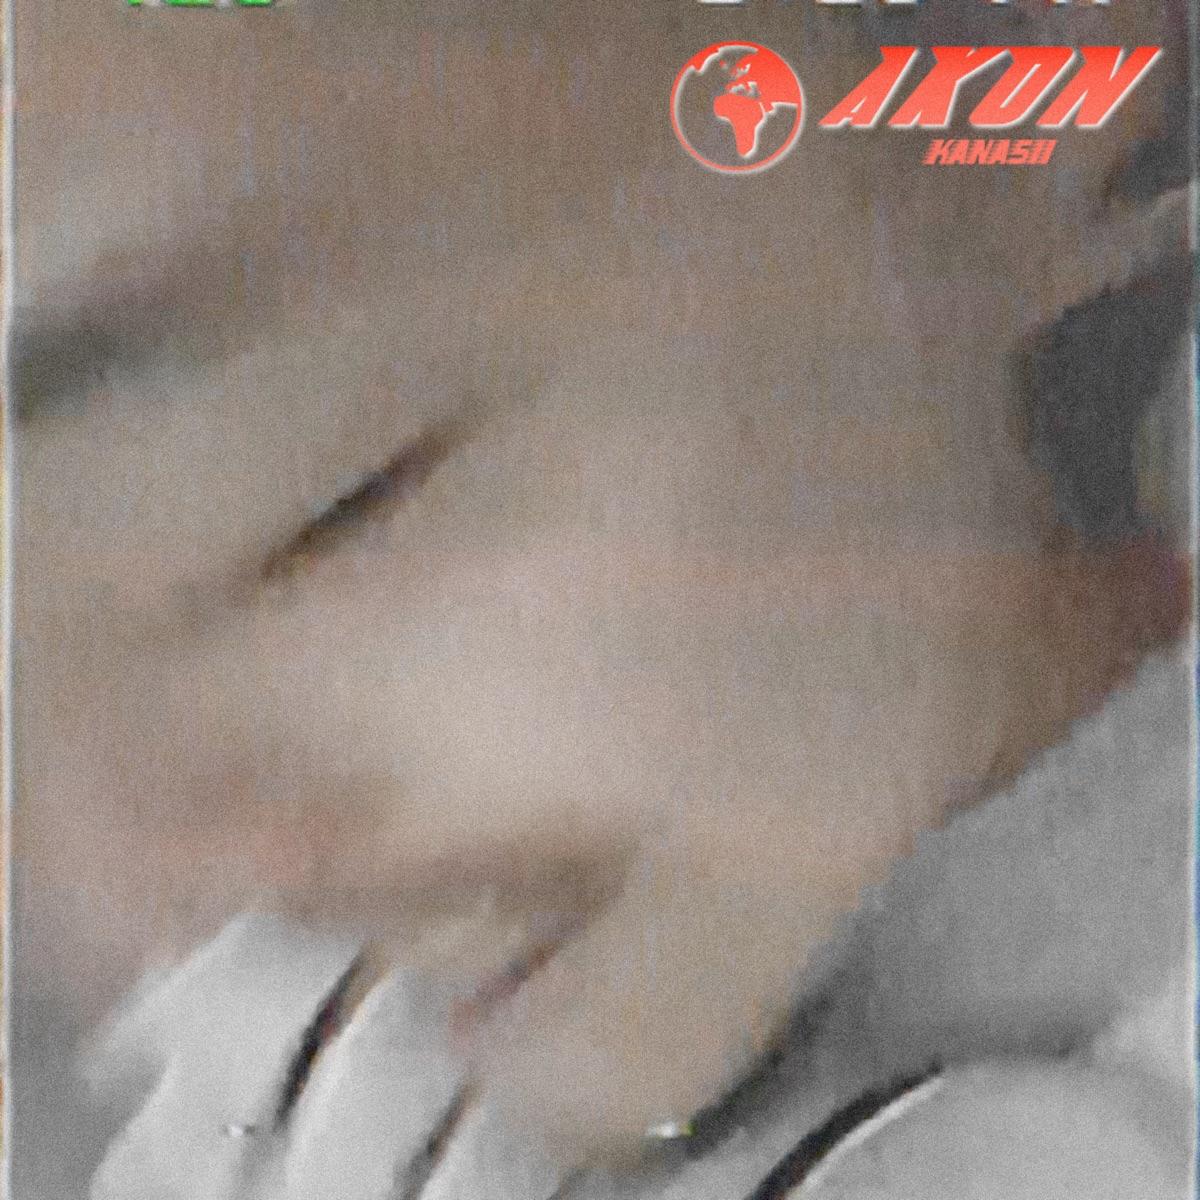 『VaVa - 悲しいAkon』収録の『悲しいAkon』ジャケット